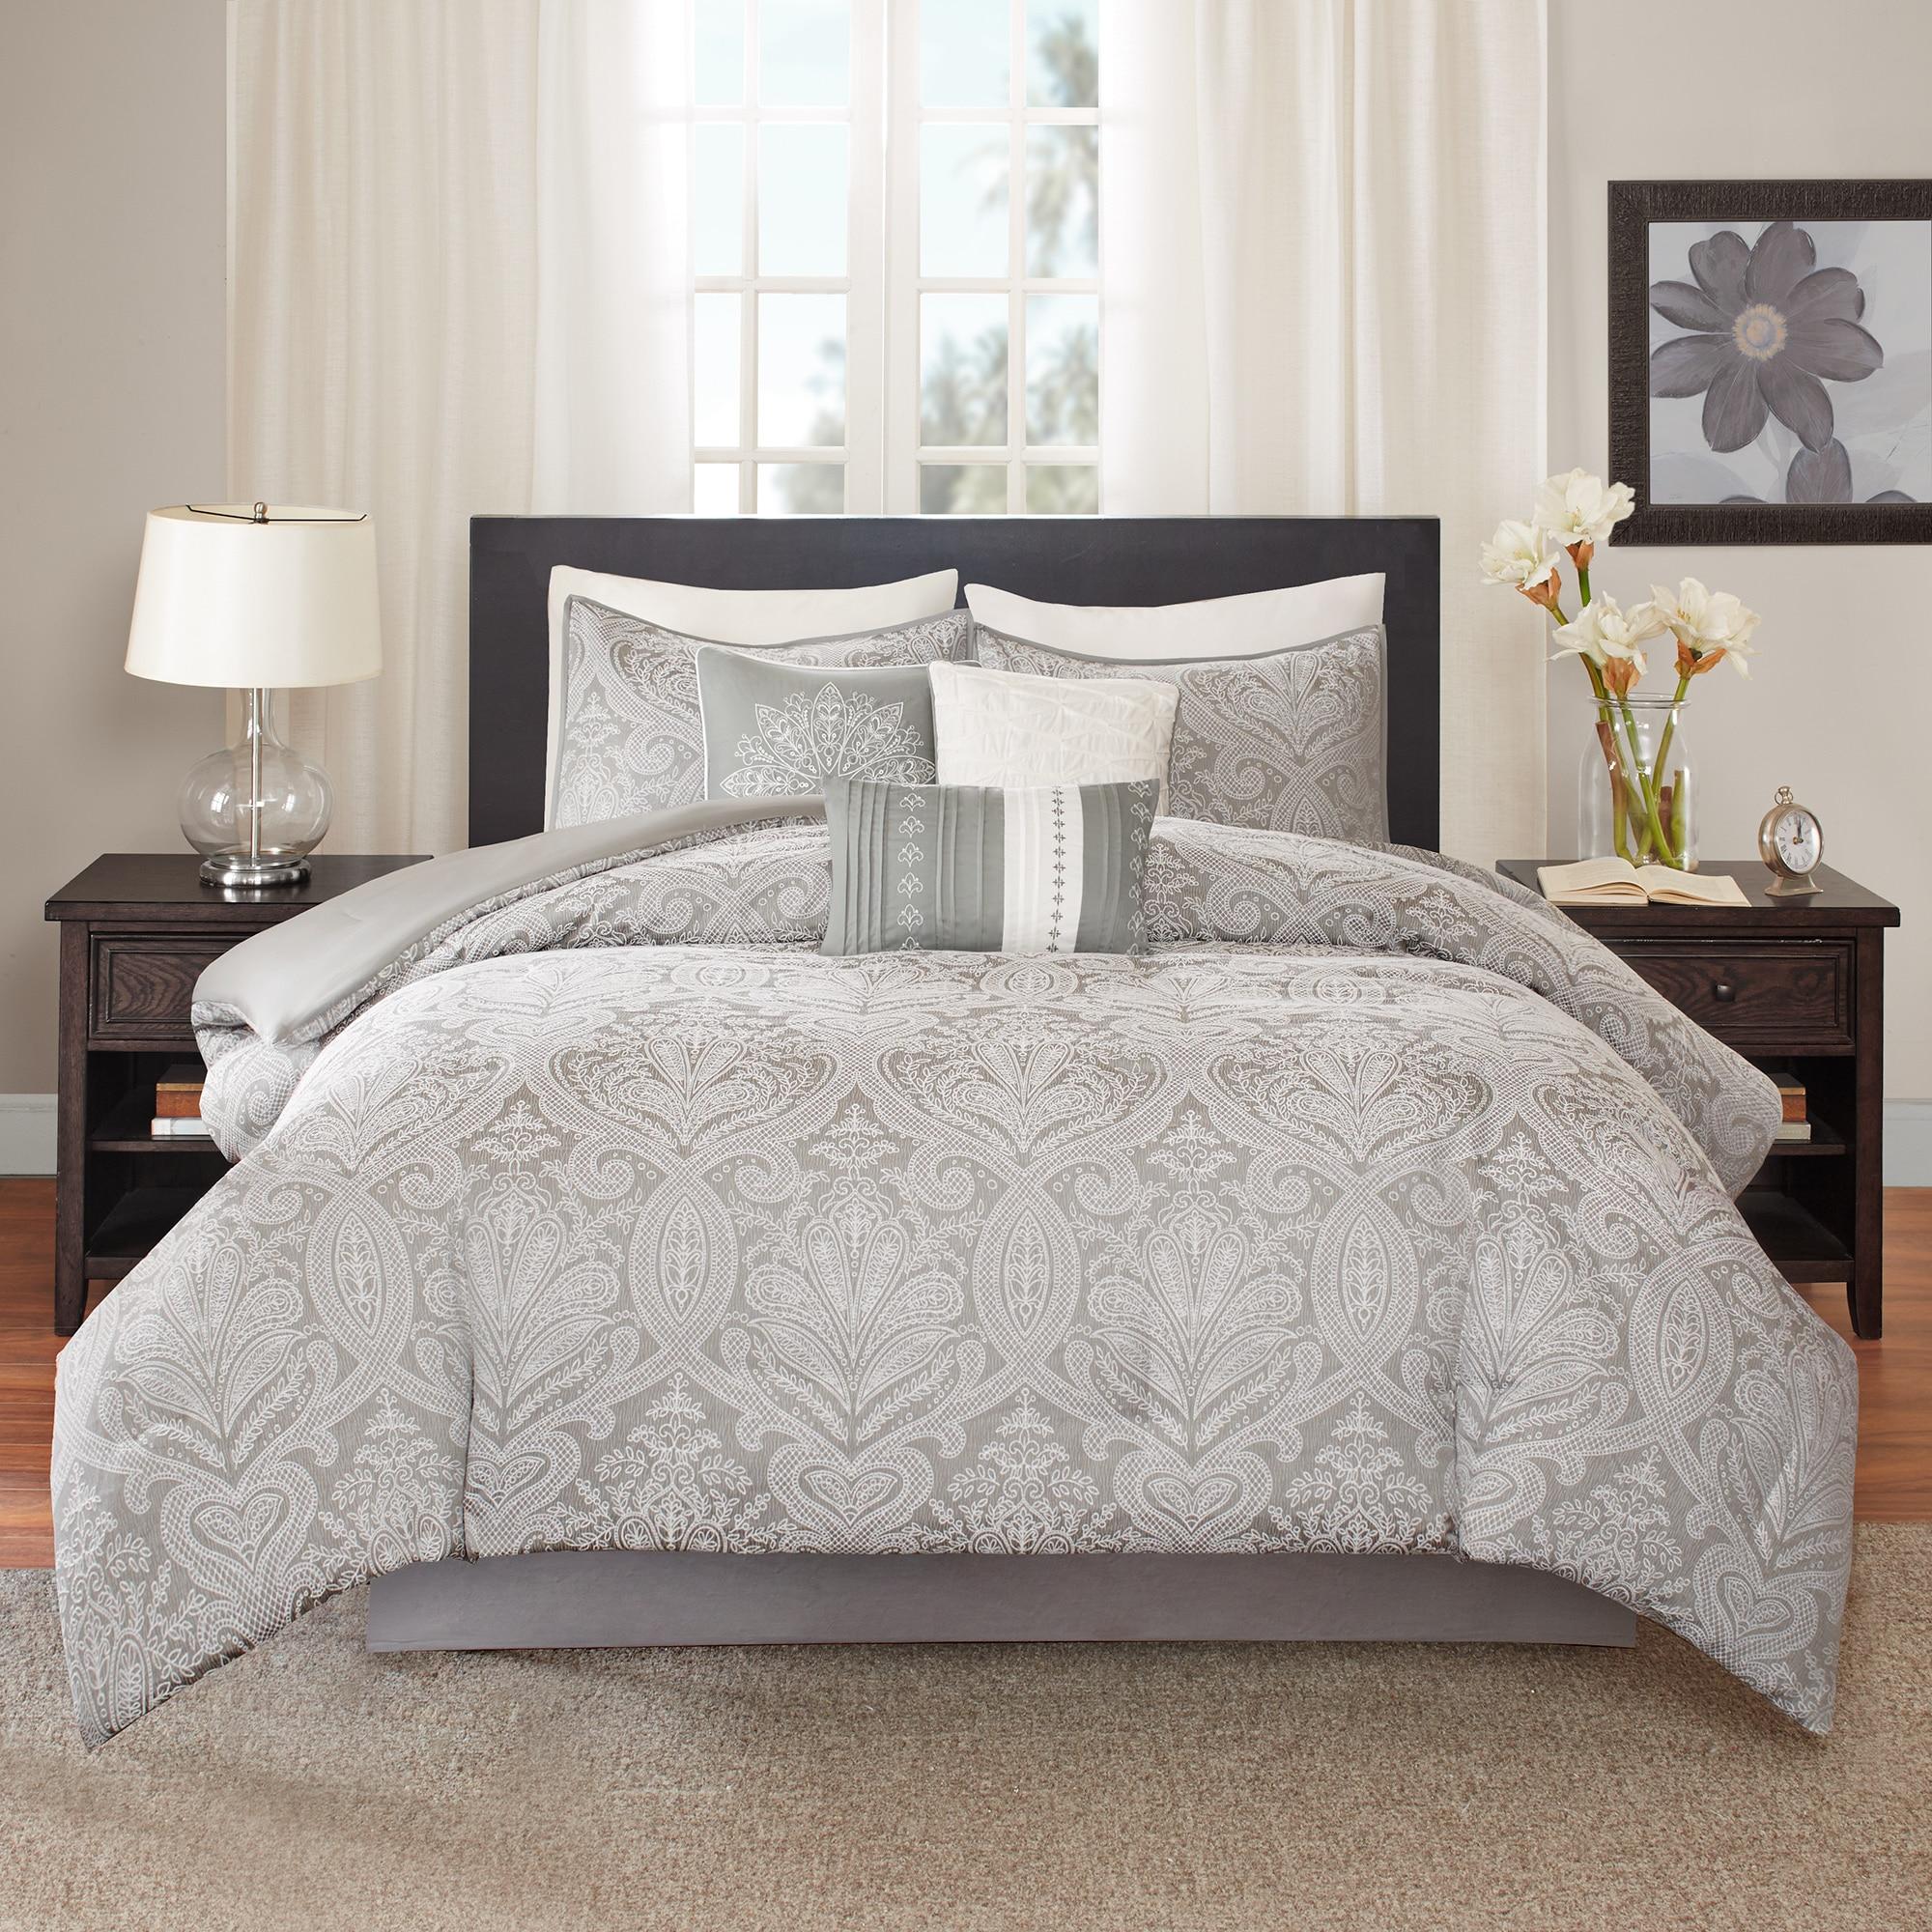 mainsail comforter kitchen bedding overstock aqua bed nautica home dp com king set amazon